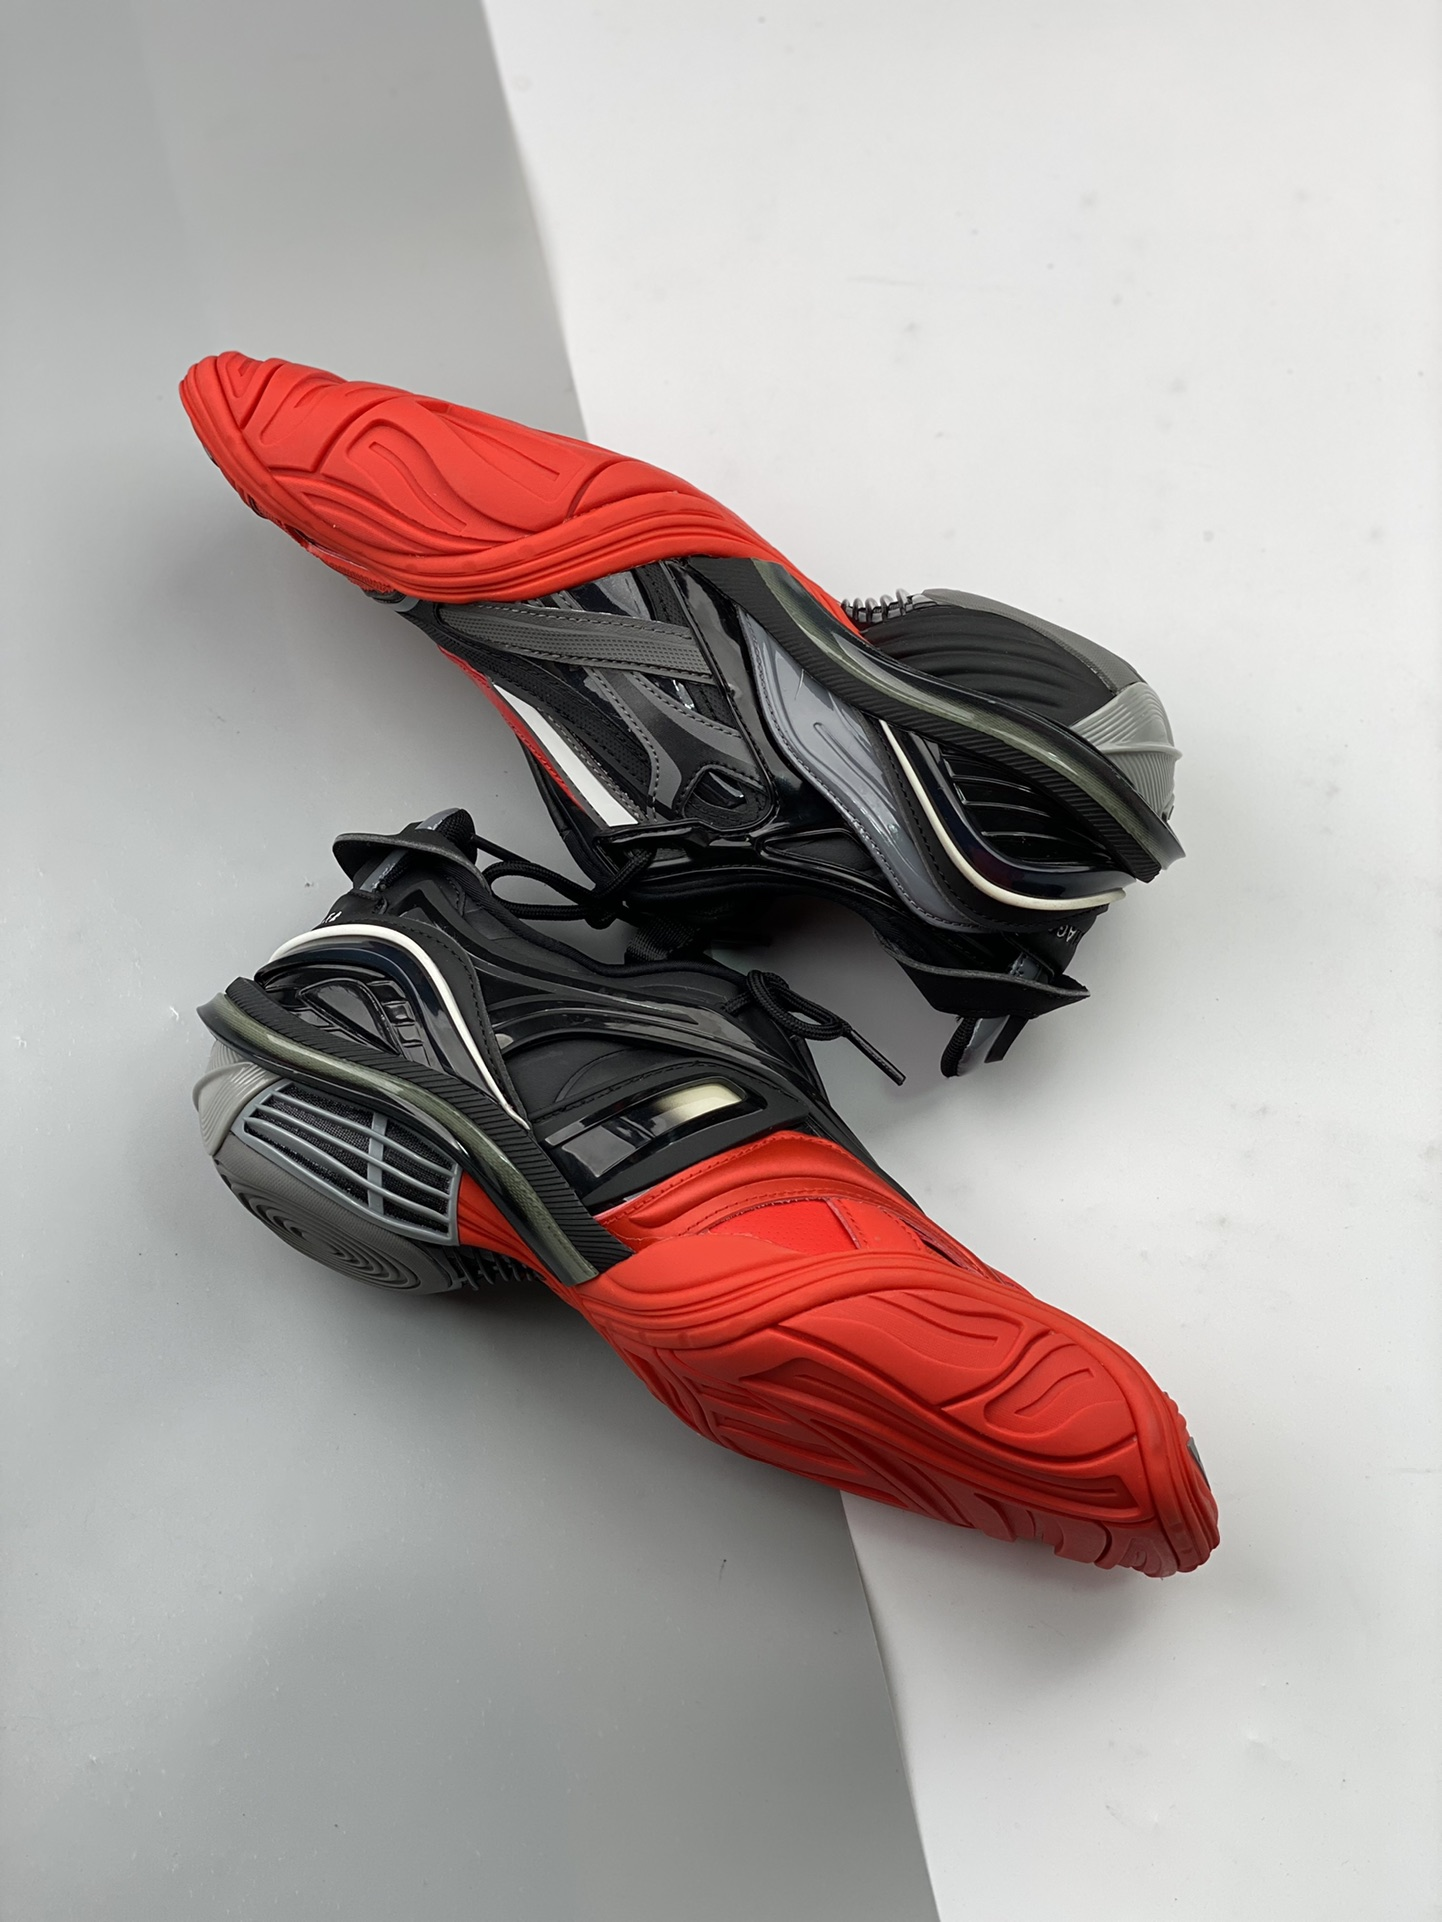 Balenciaga Runway Tyrex  Panelled Trainers巴黎世家20ss_河源裸鞋是不是正品